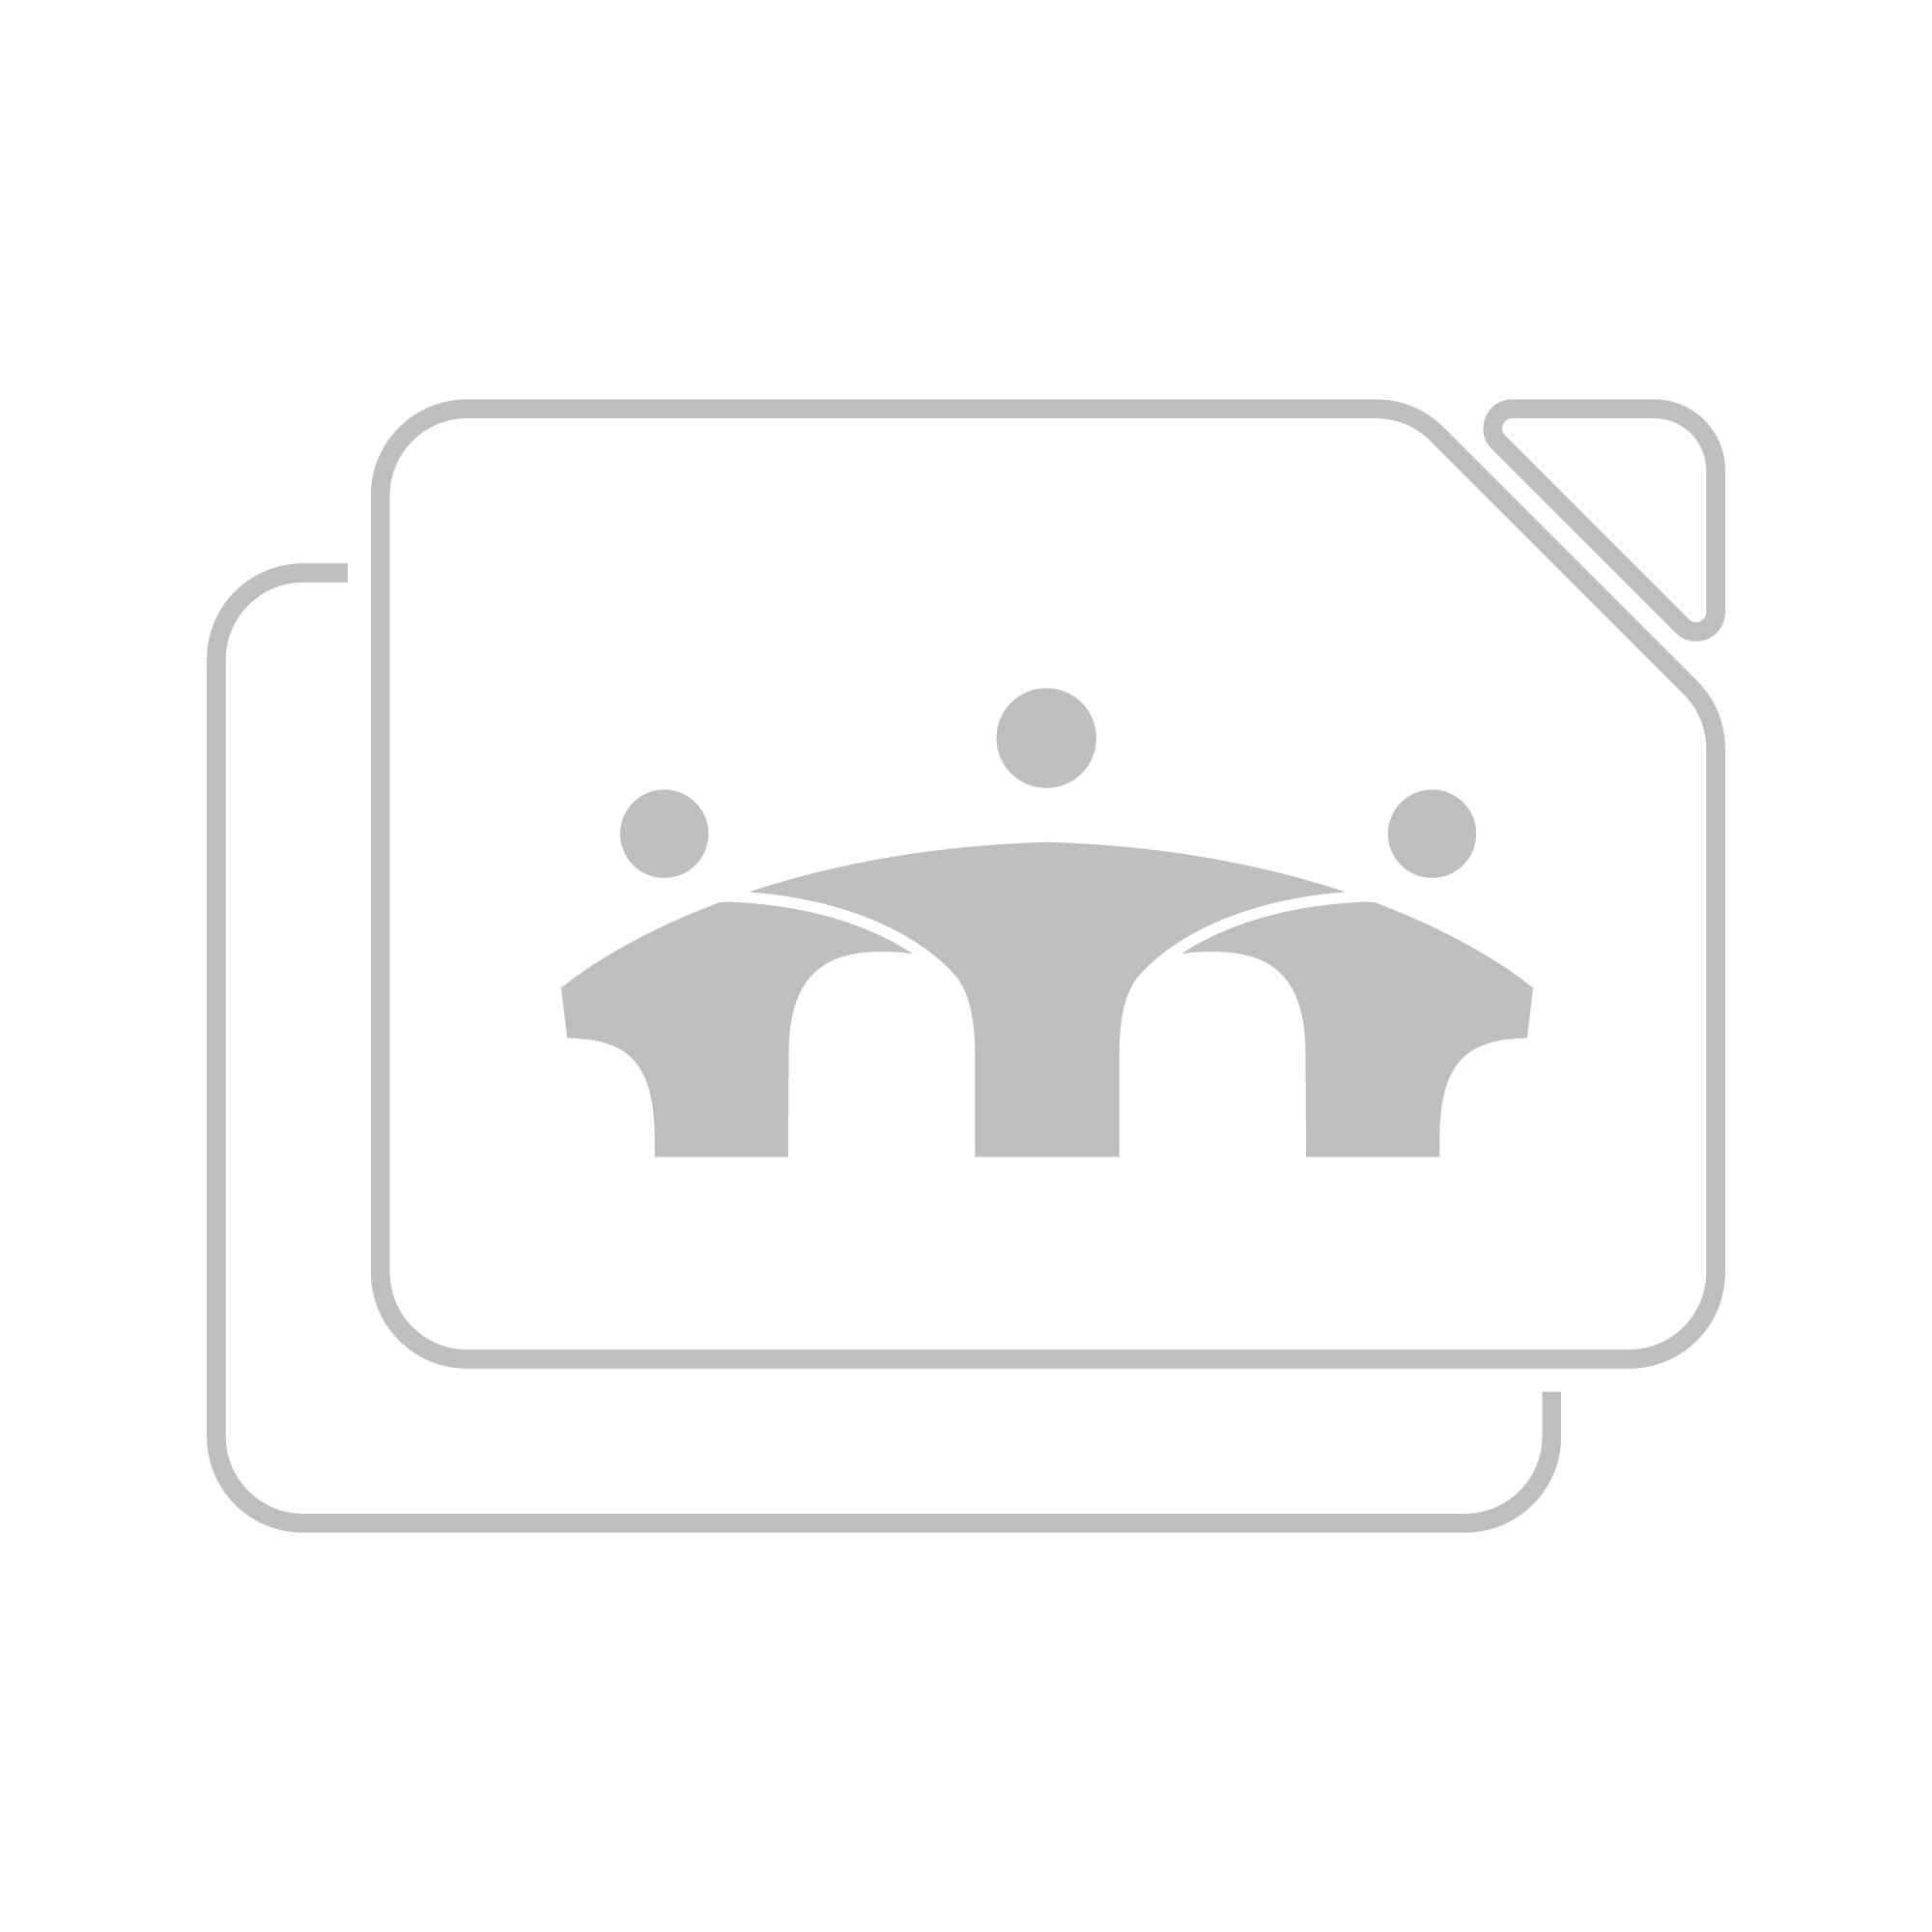 SanDisk Ultra Extreme Go 3.2 64GB